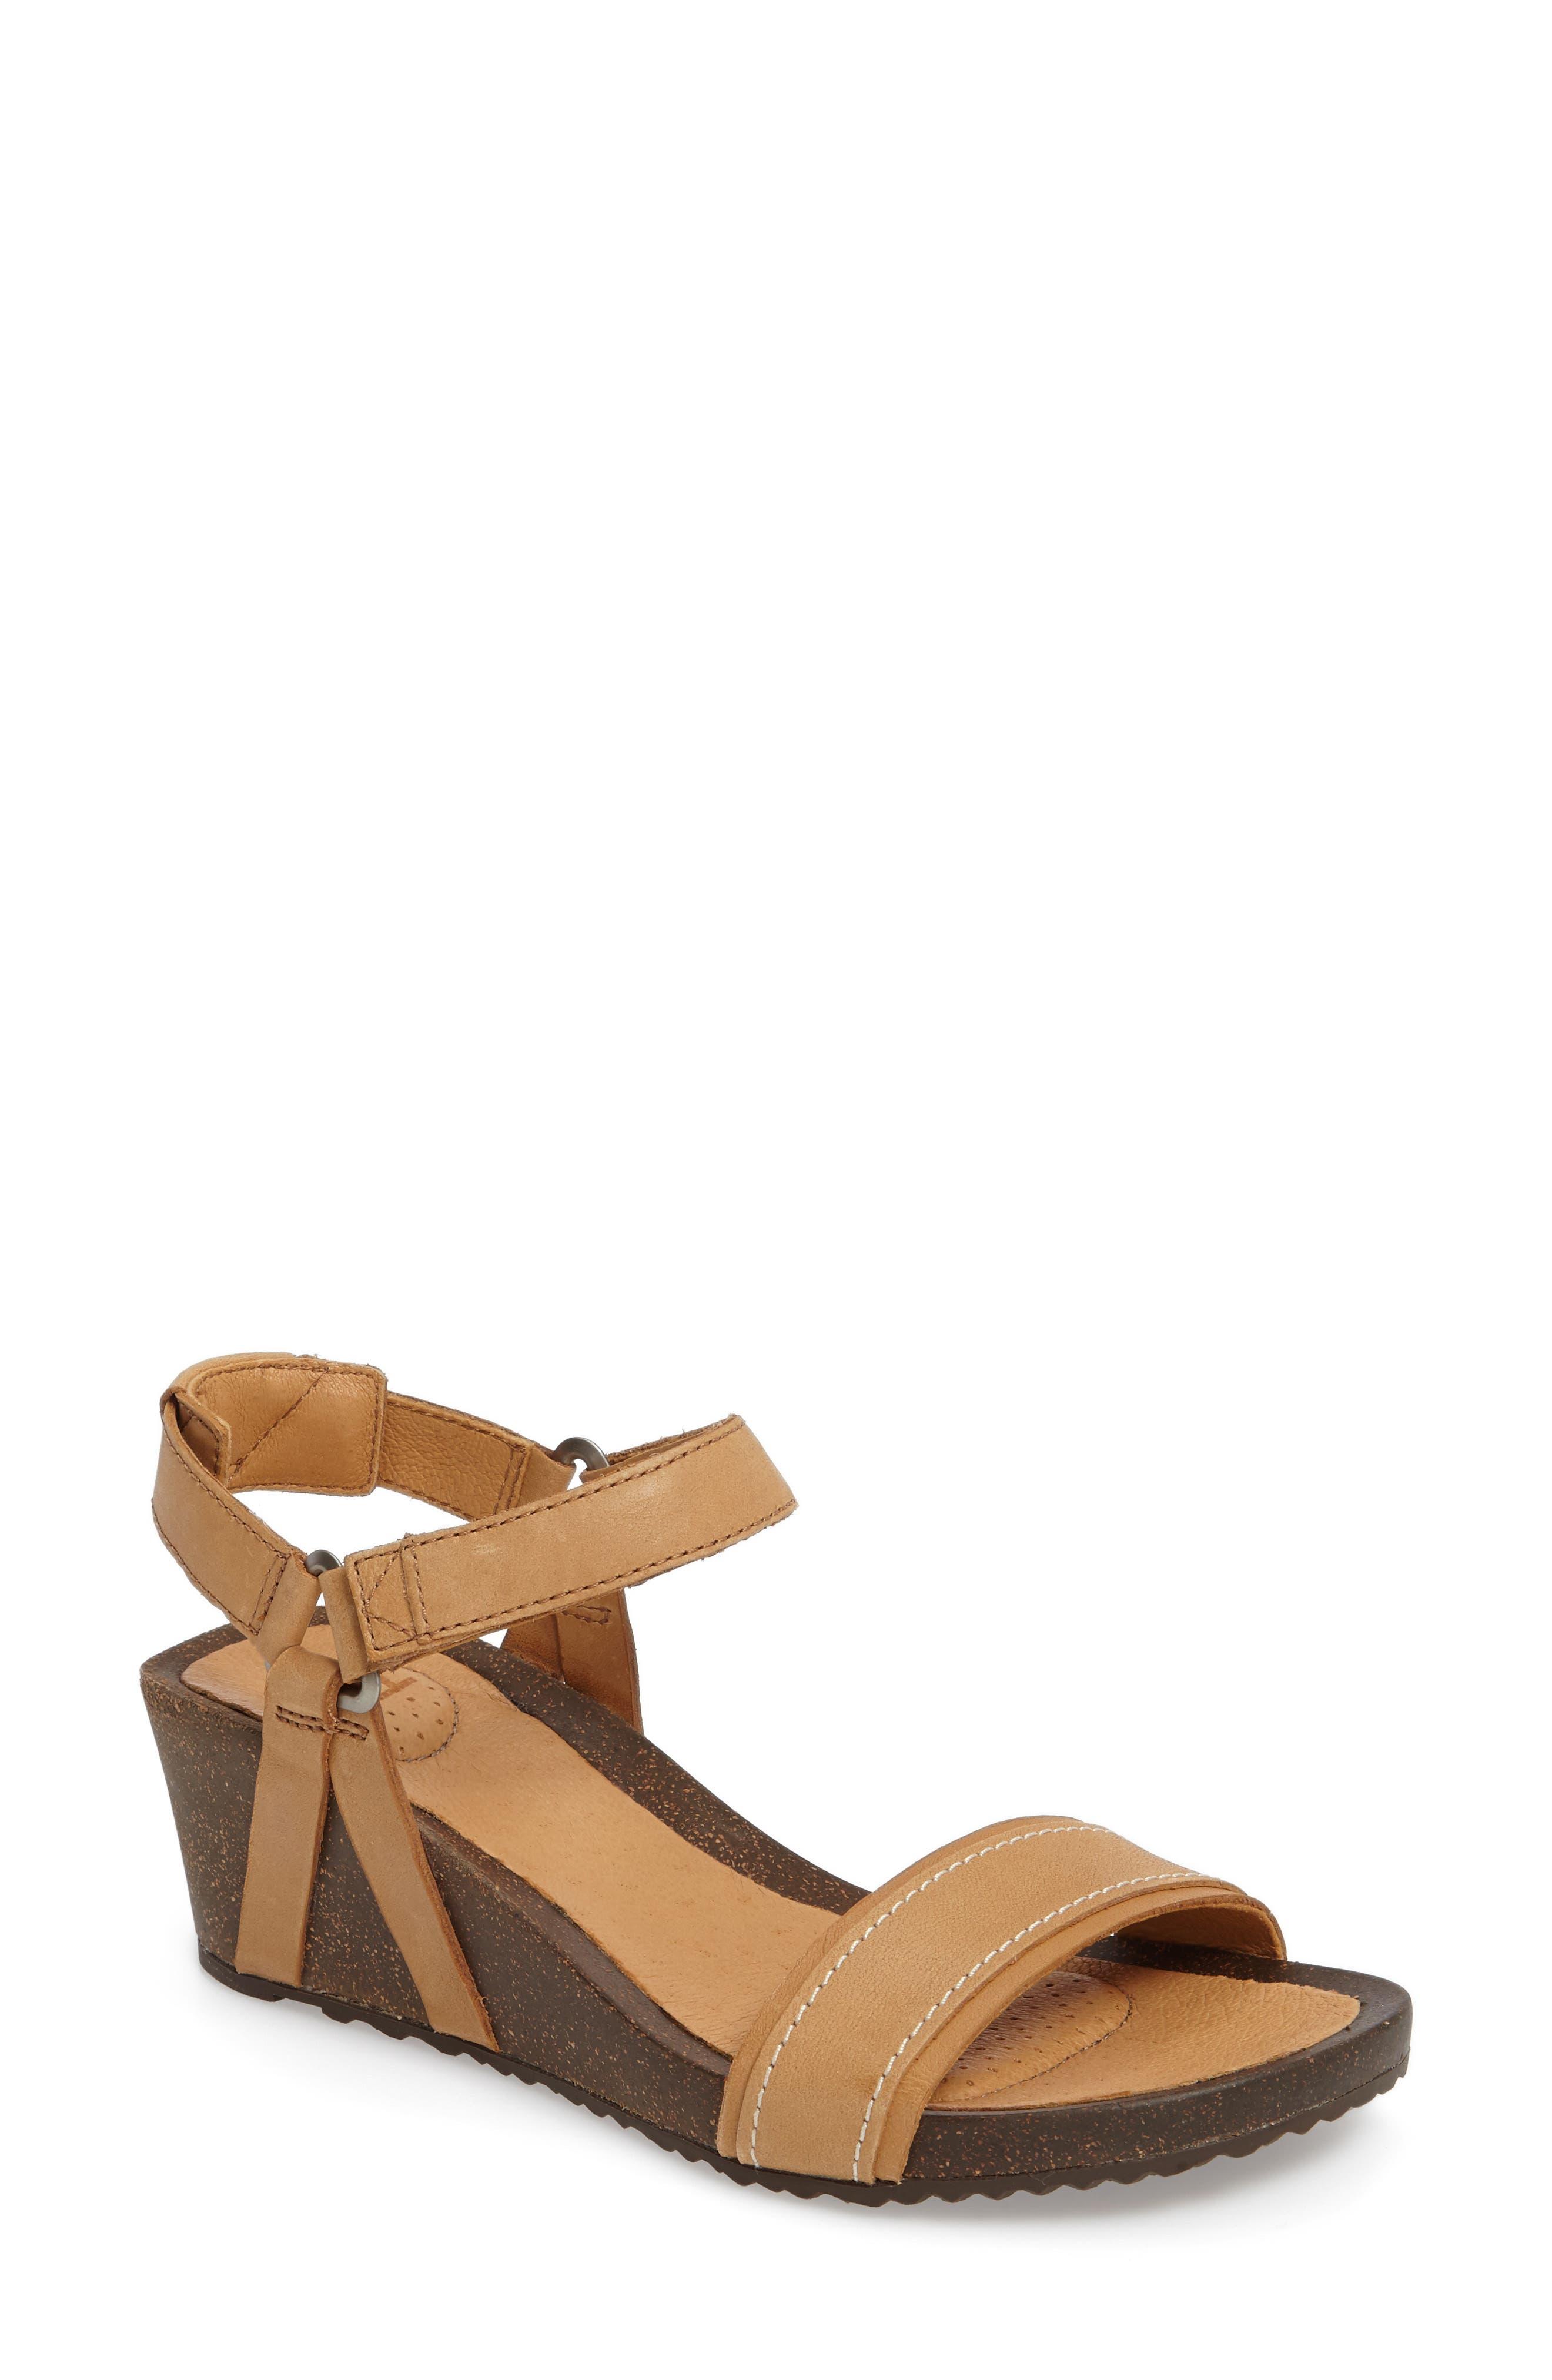 Main Image - Tevo Ysidro Stitch Wedge Sandal (Women)